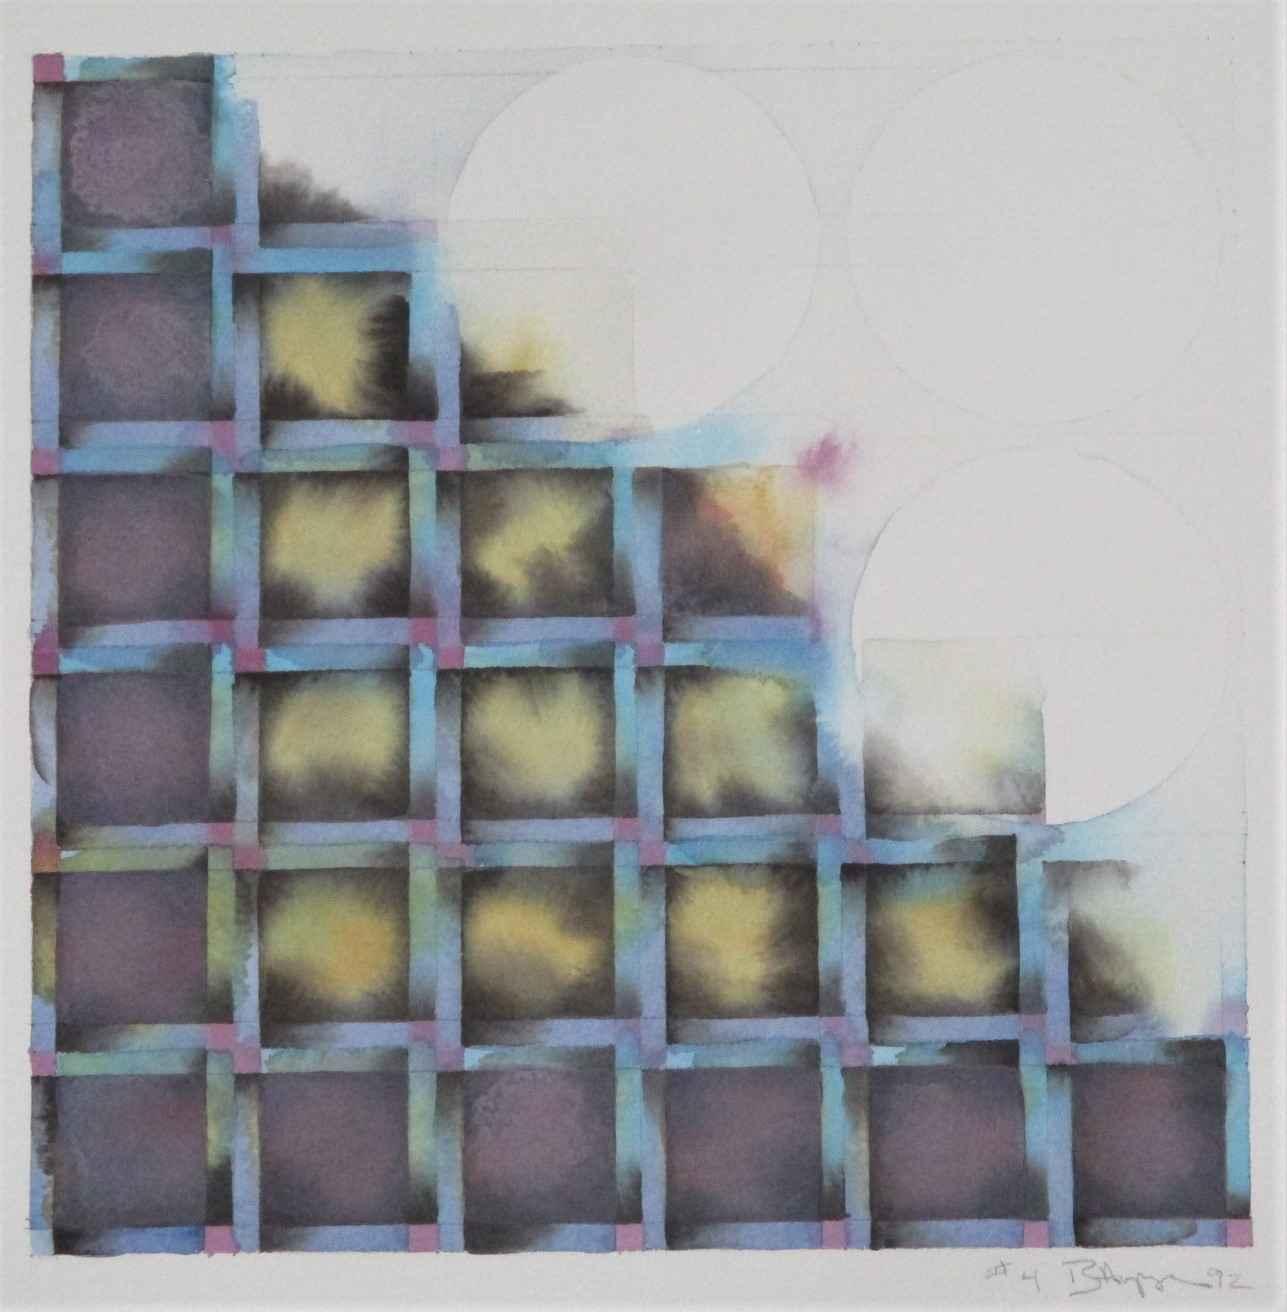 Untitled #4 by  Bill Hoppe - Masterpiece Online